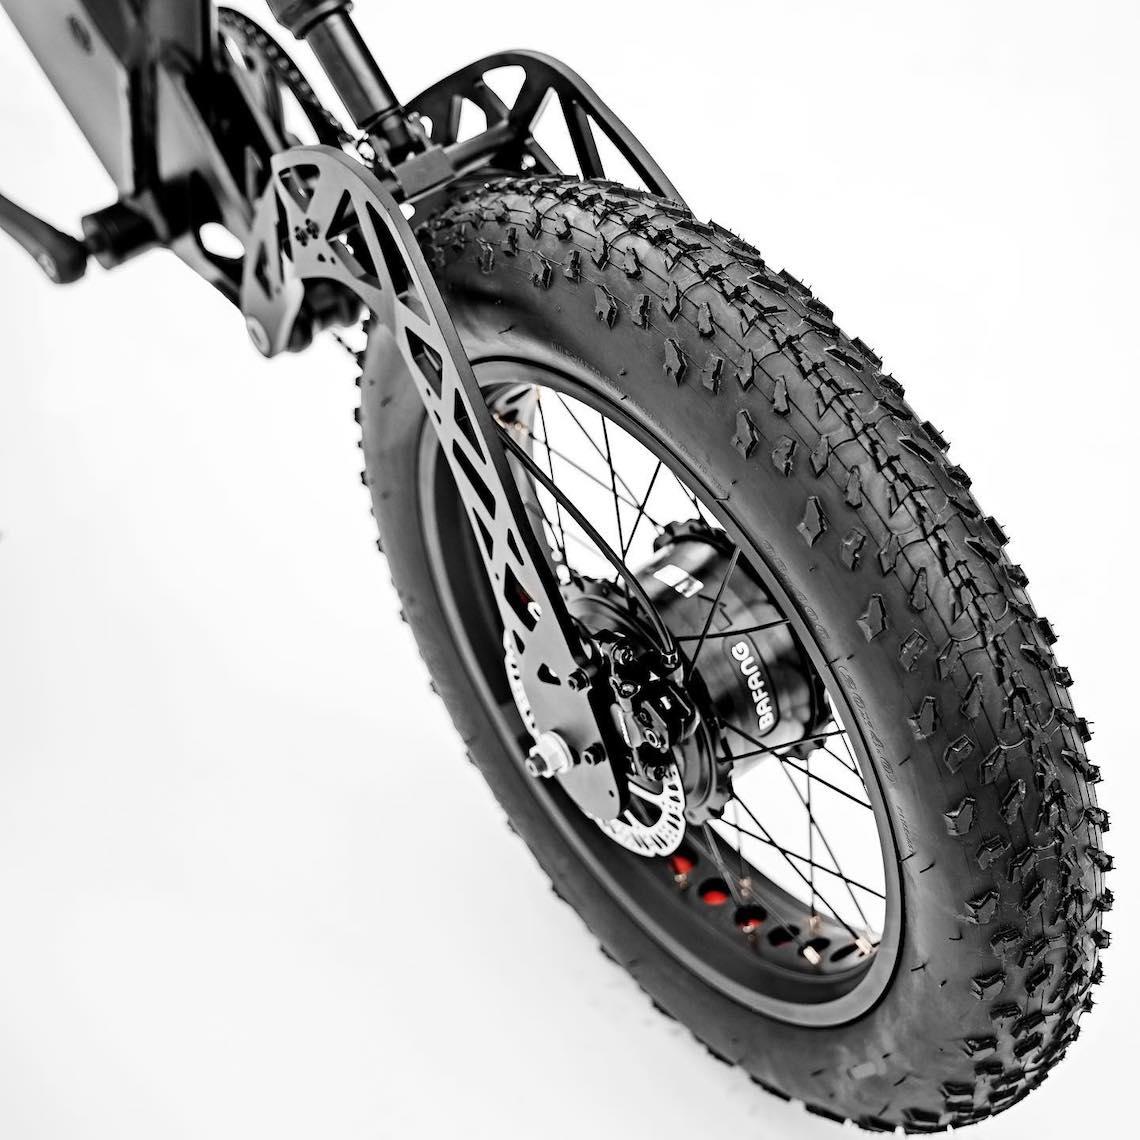 ANNOBIKE fat e-bike_urbancycling_it_6